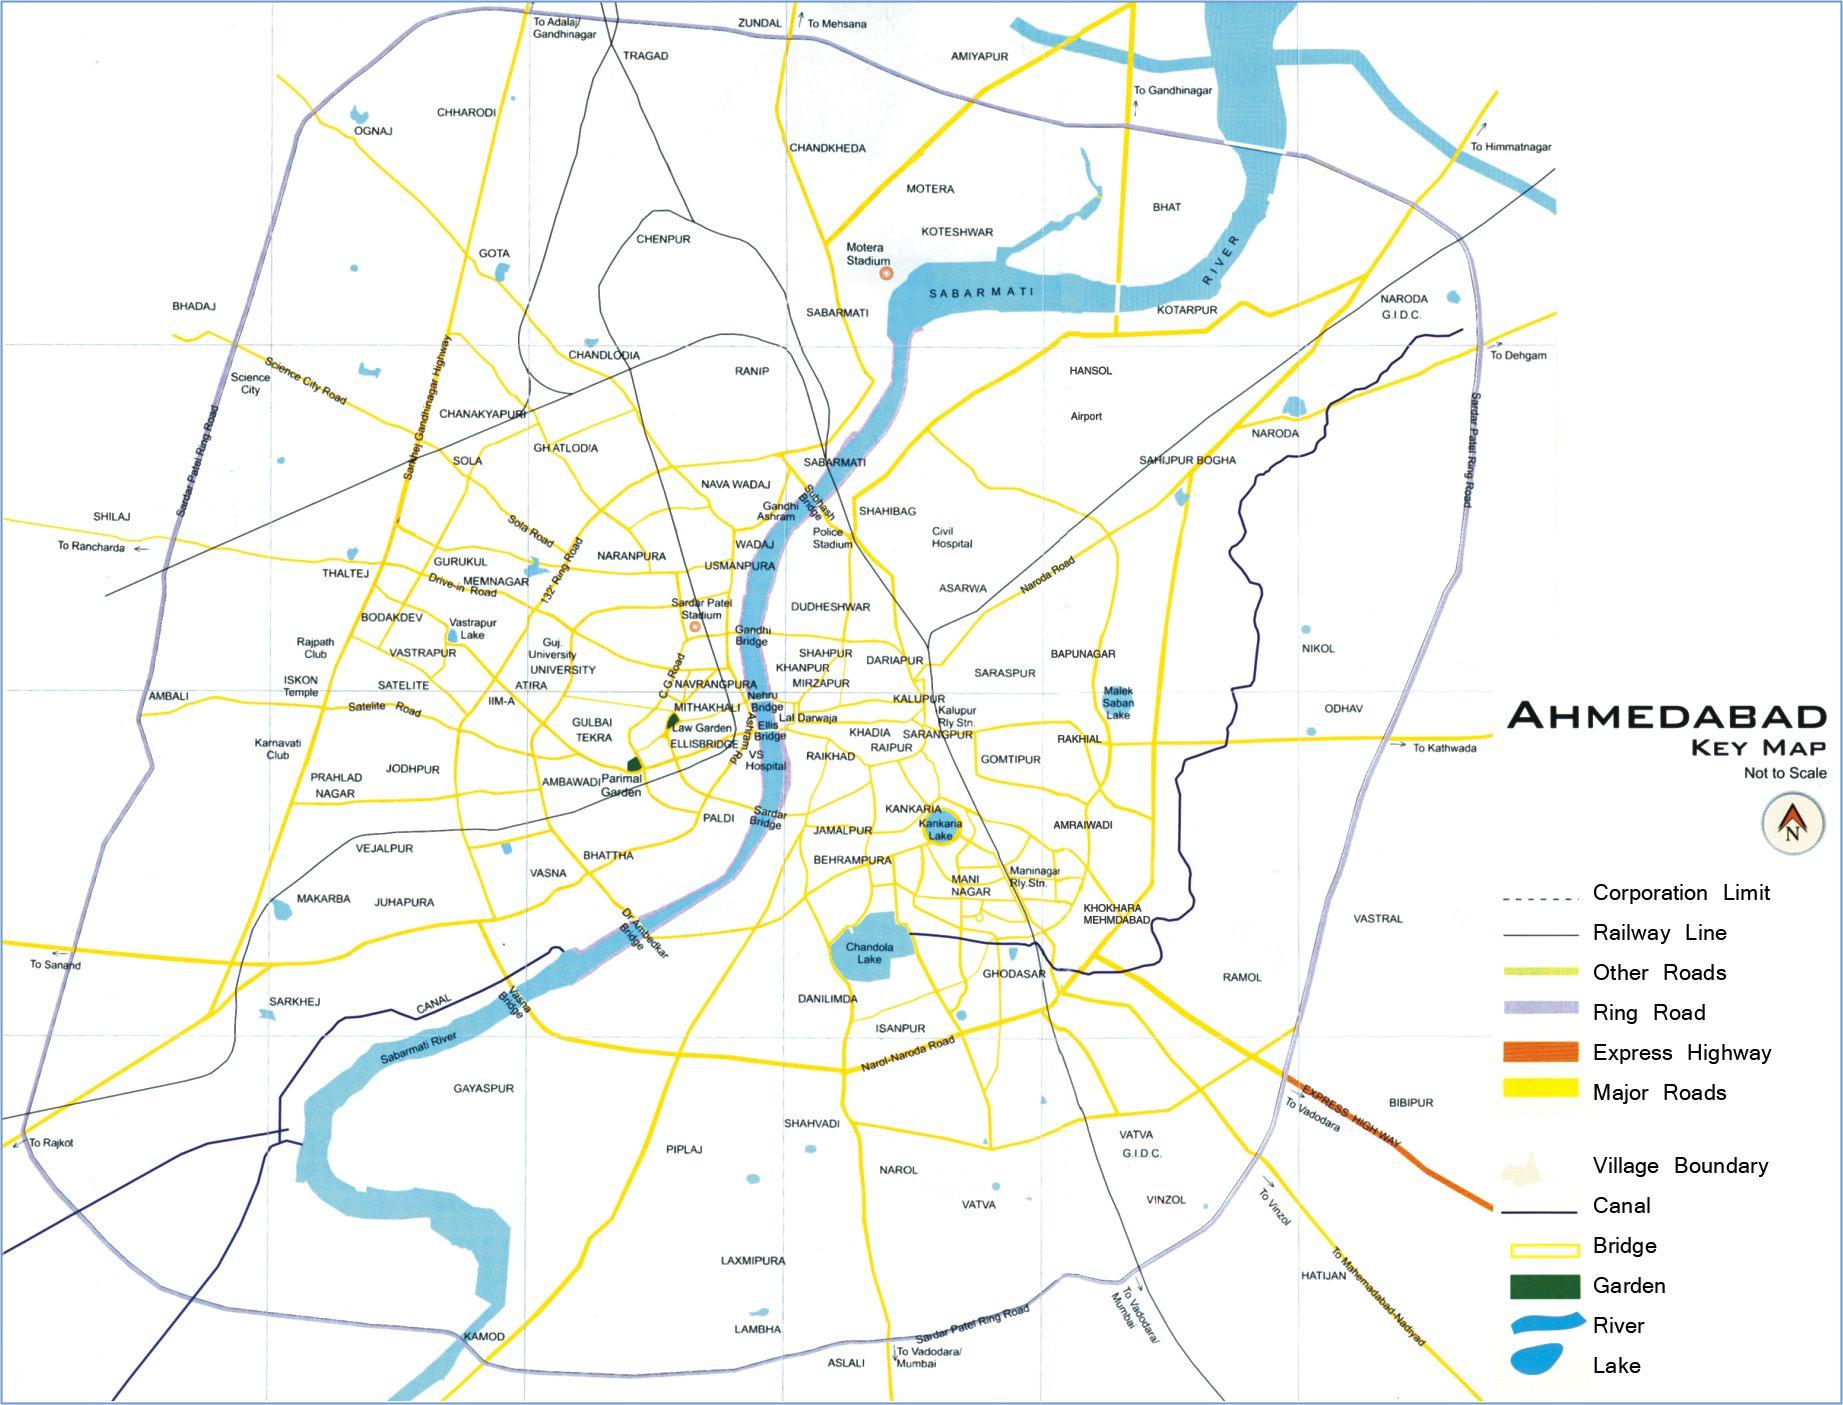 Ahmedabad City Map ile ilgili görsel sonucu